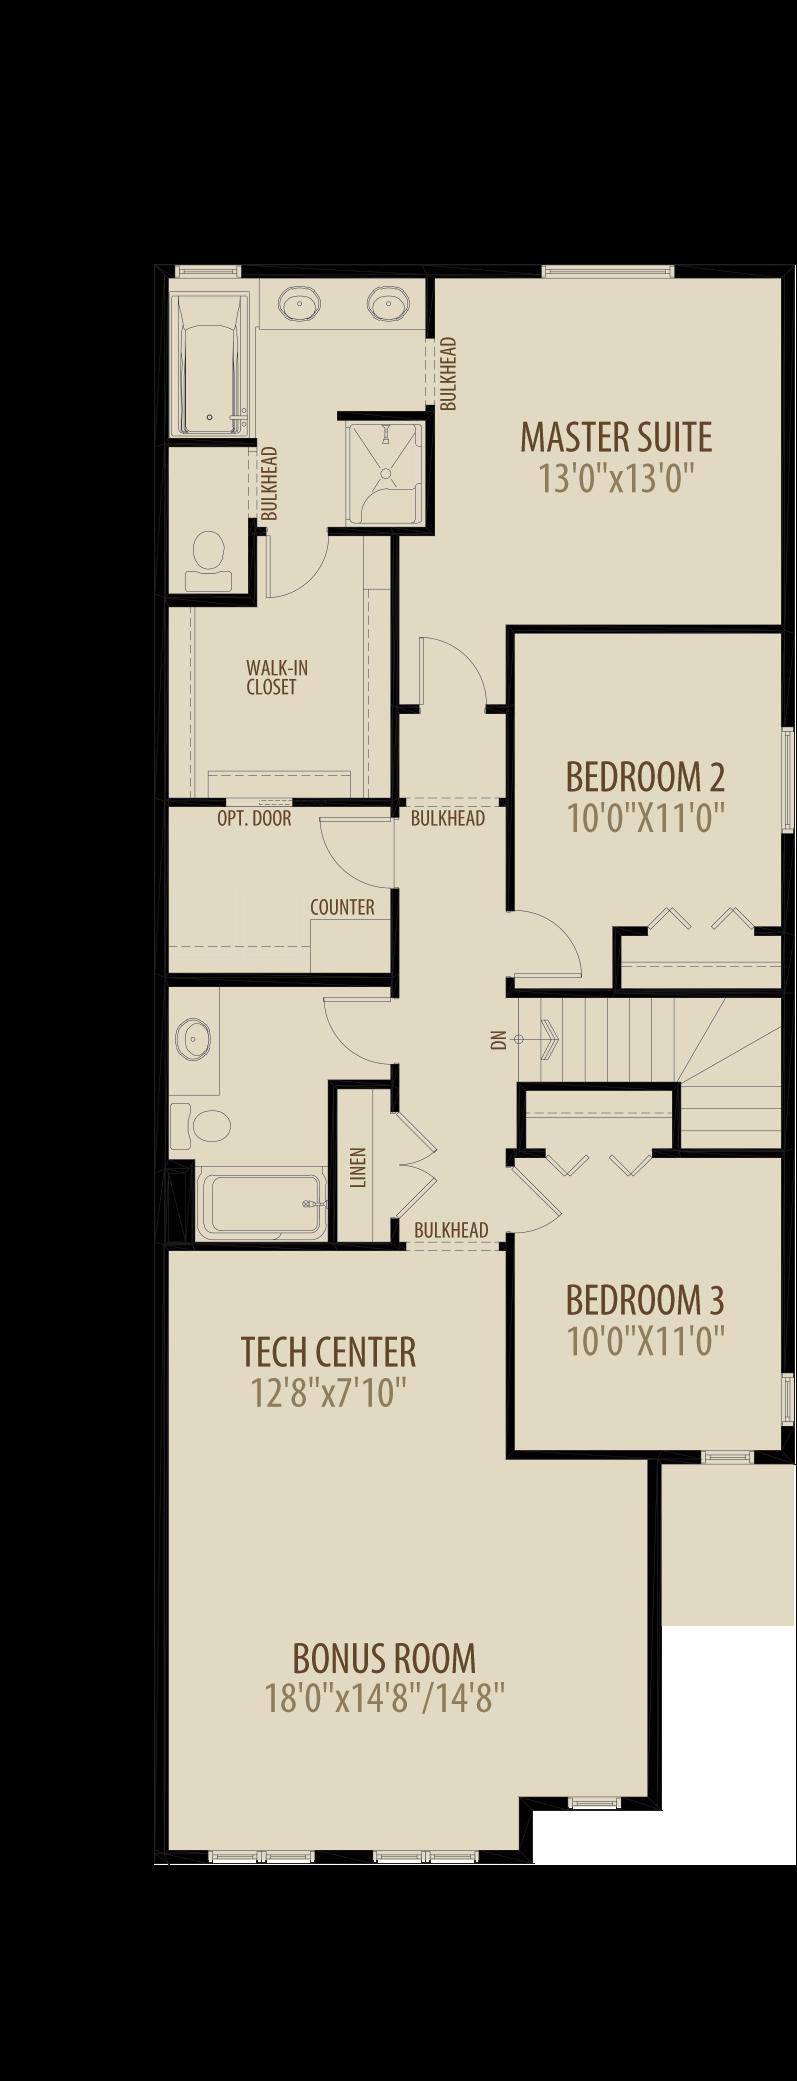 Upper Floor Plan w/ Option 7 - Livingston Standard Plan (Adds 210 sq ft)